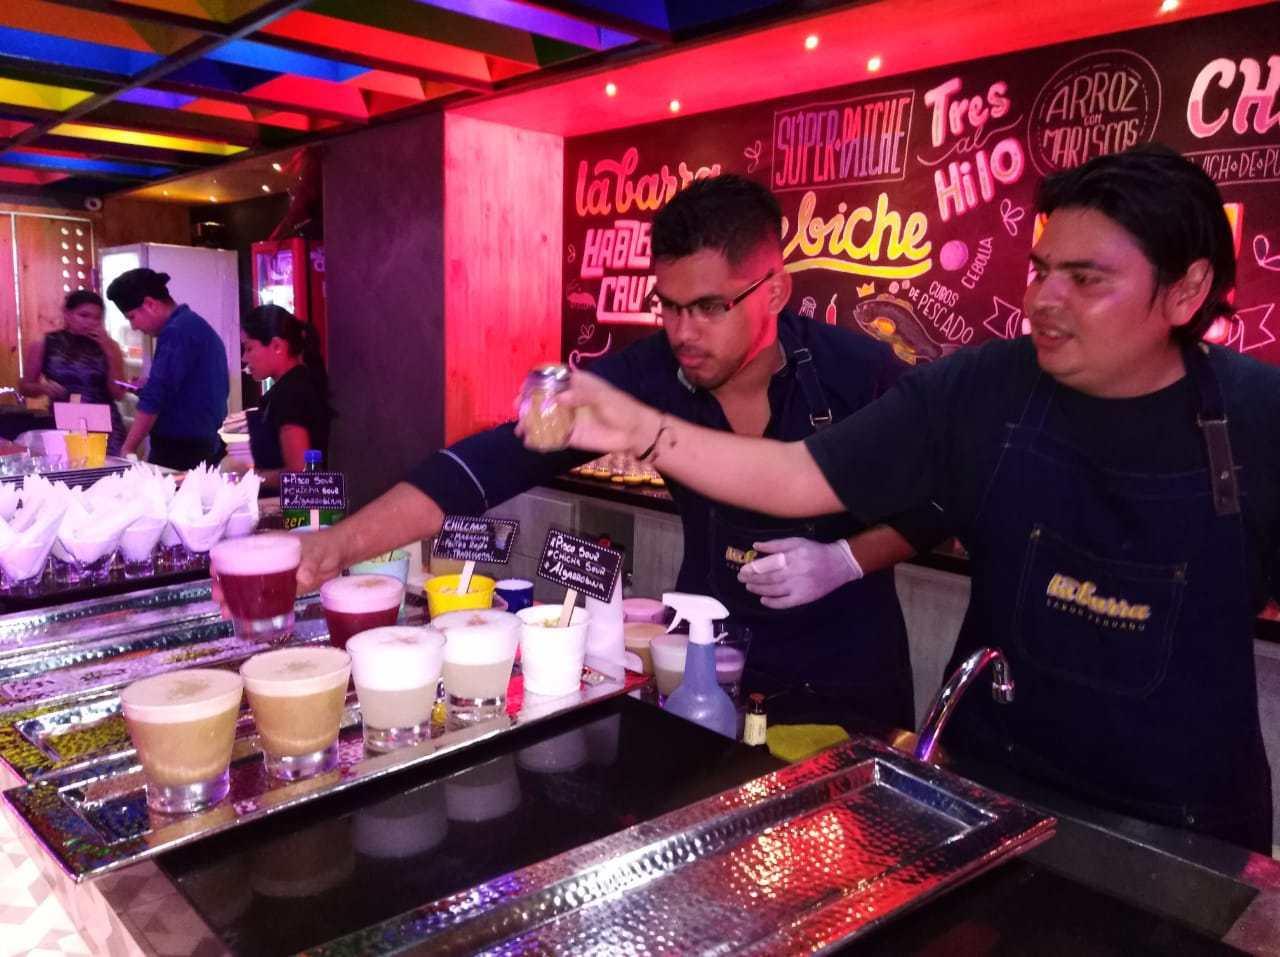 sabor peruano - Bolivia: Restaurante peruano aterriza en centro comercial de Santa Cruz